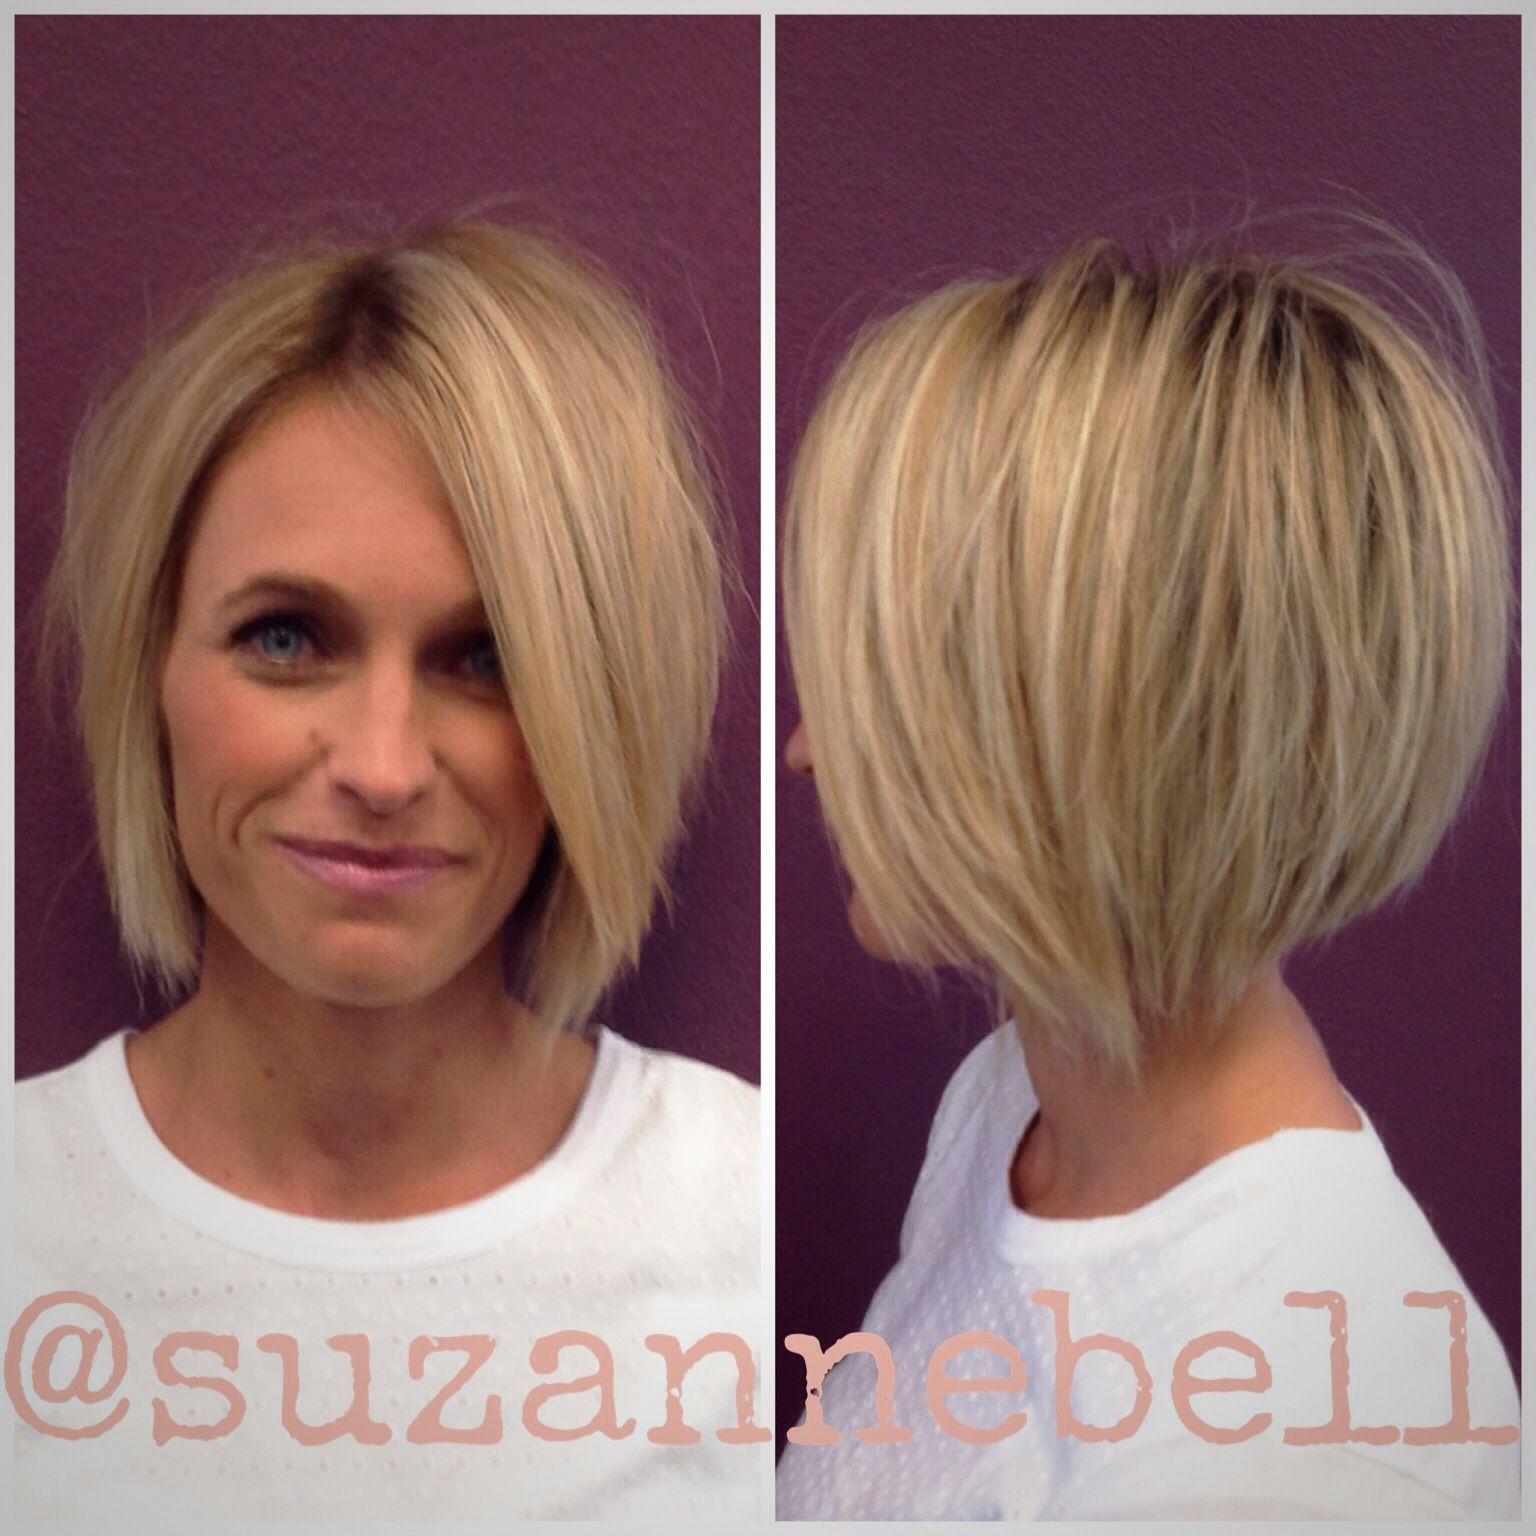 Cute haircuts for short hair - Short Blonde Shattered Bob Short Hair Bob Haircut Undercut